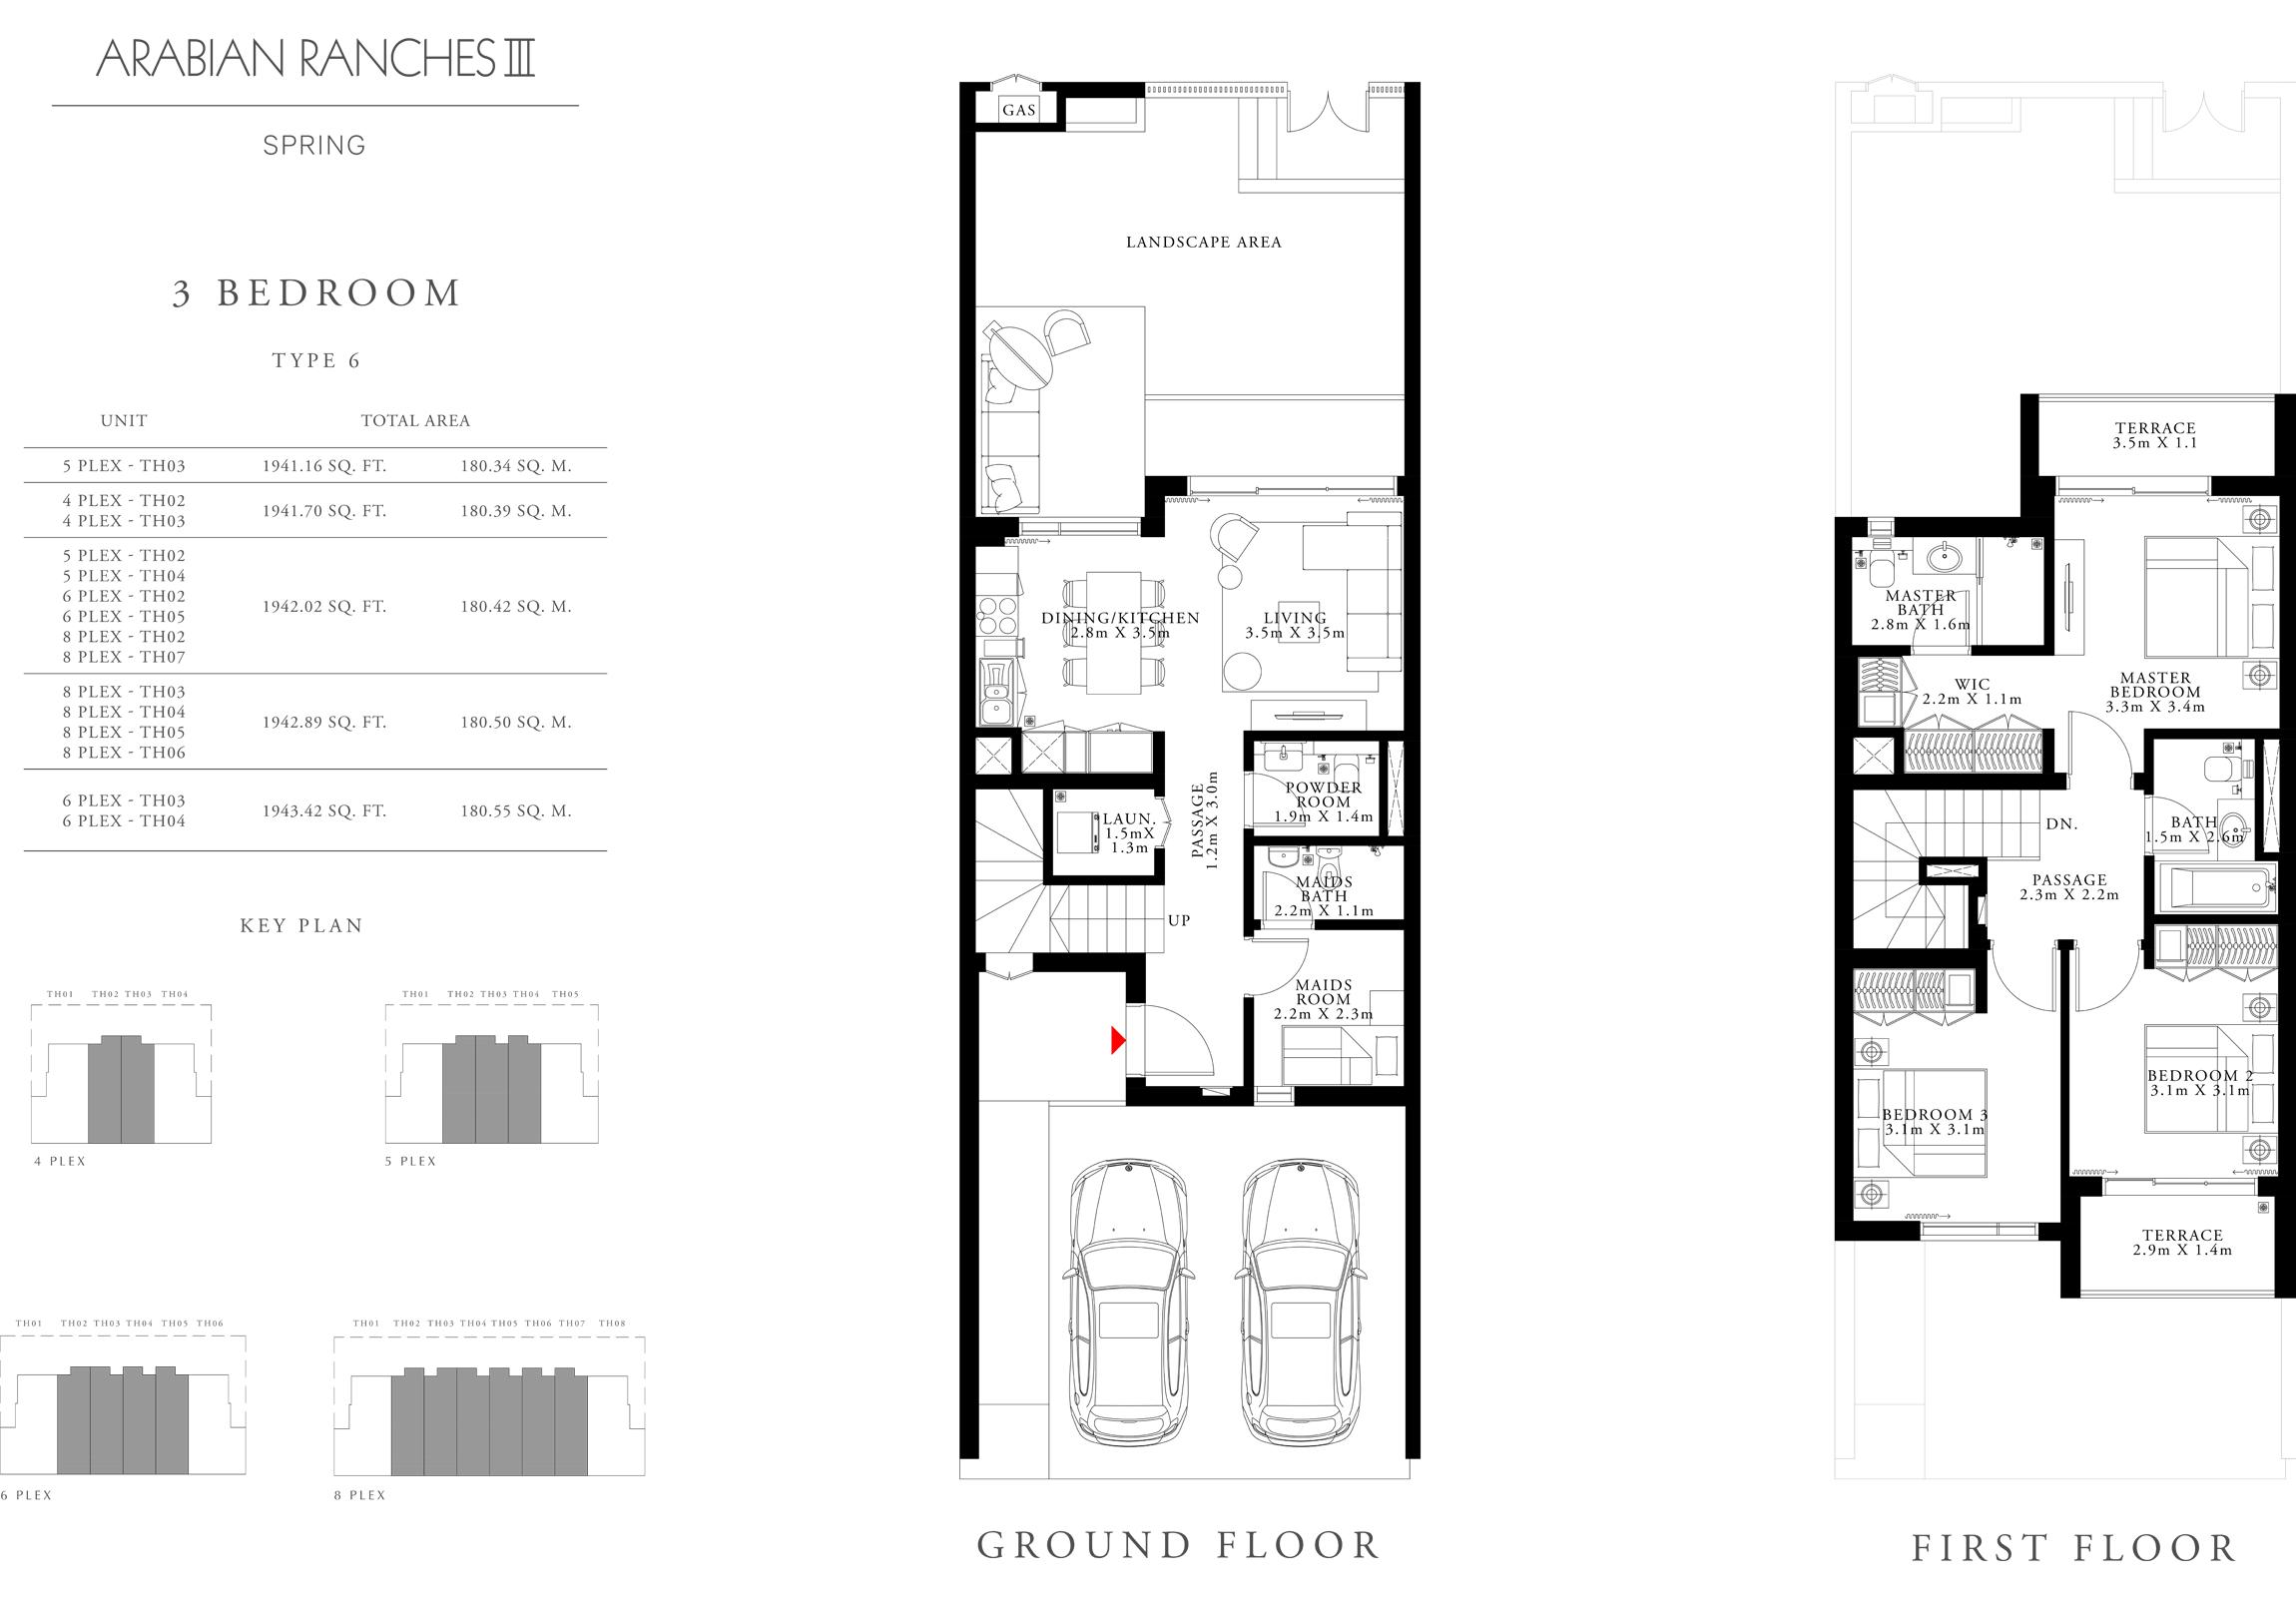 3 غرف نوم، نوع 6، حجم 1943.42 قدم مربع